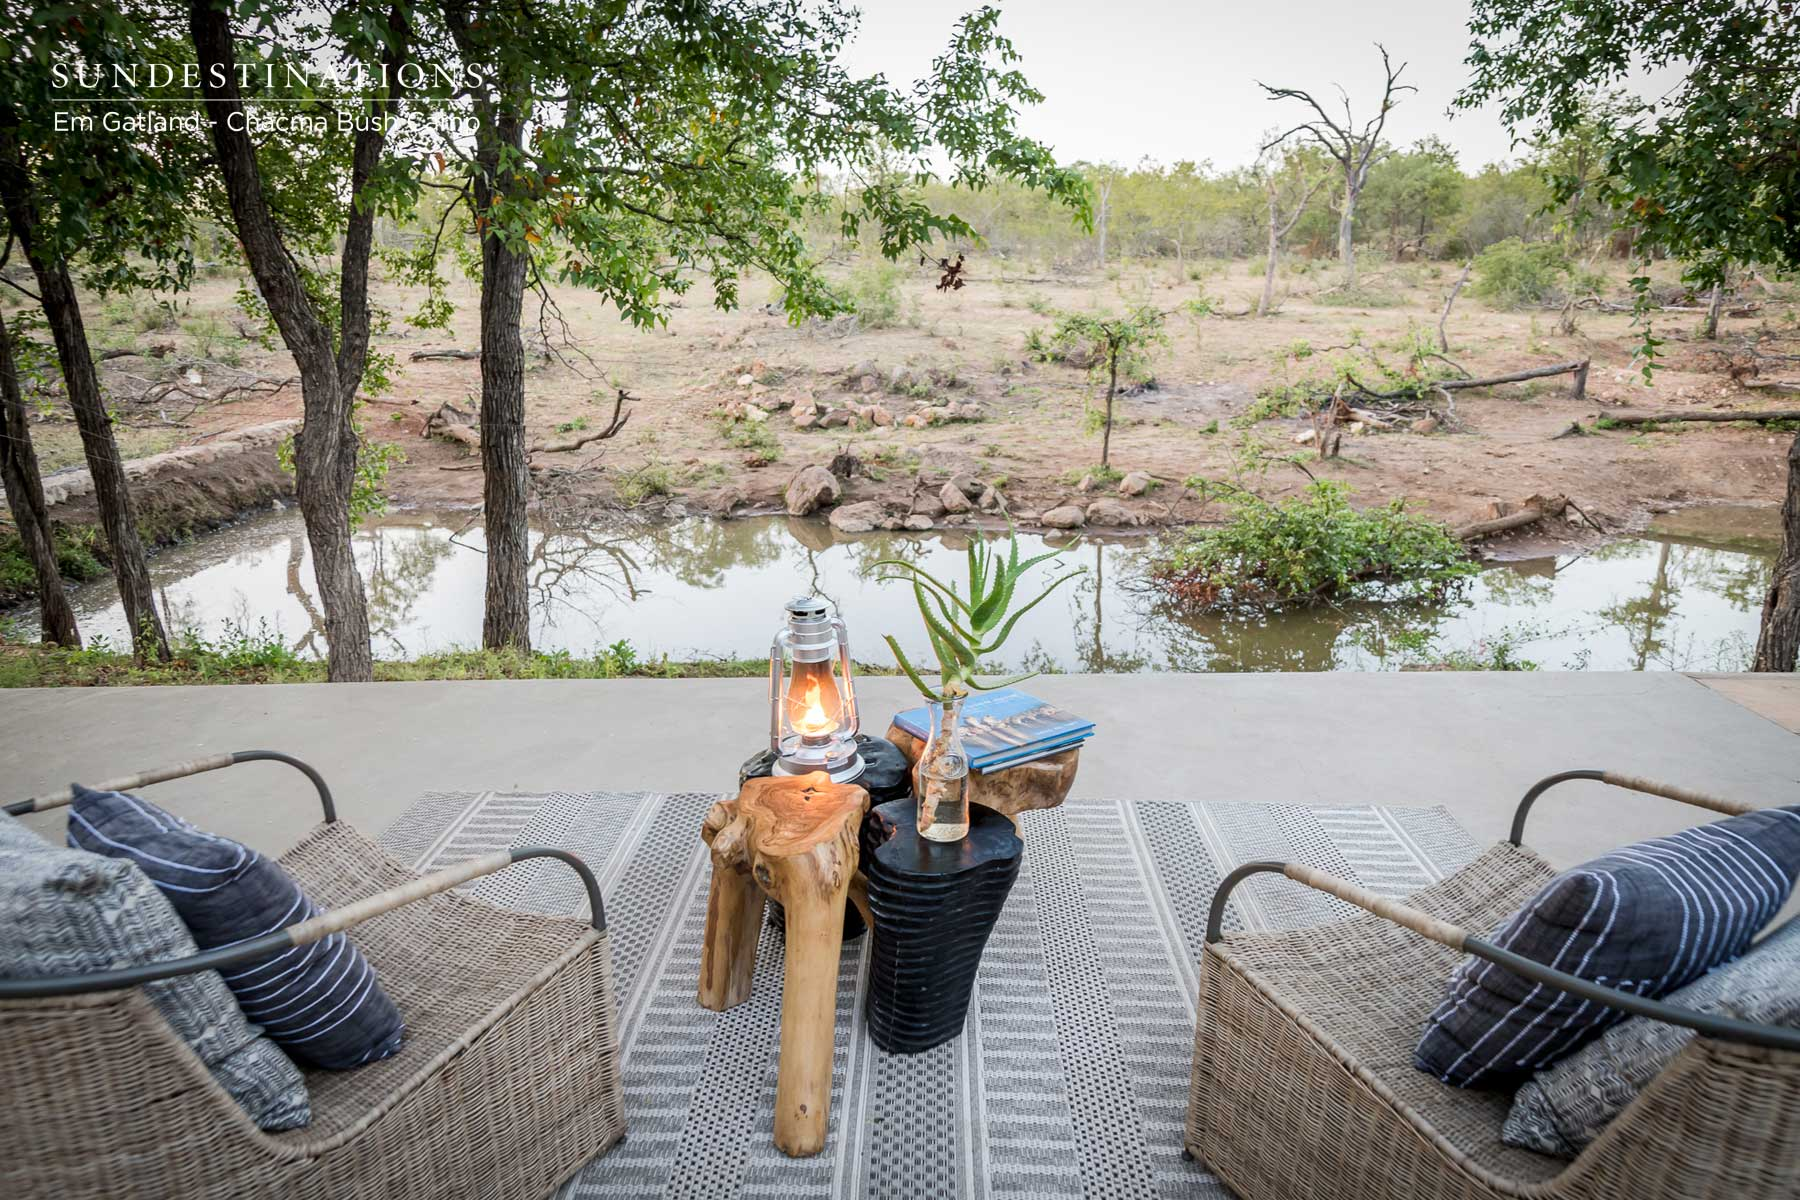 Views of the Waterhole Chacma Bush Camp